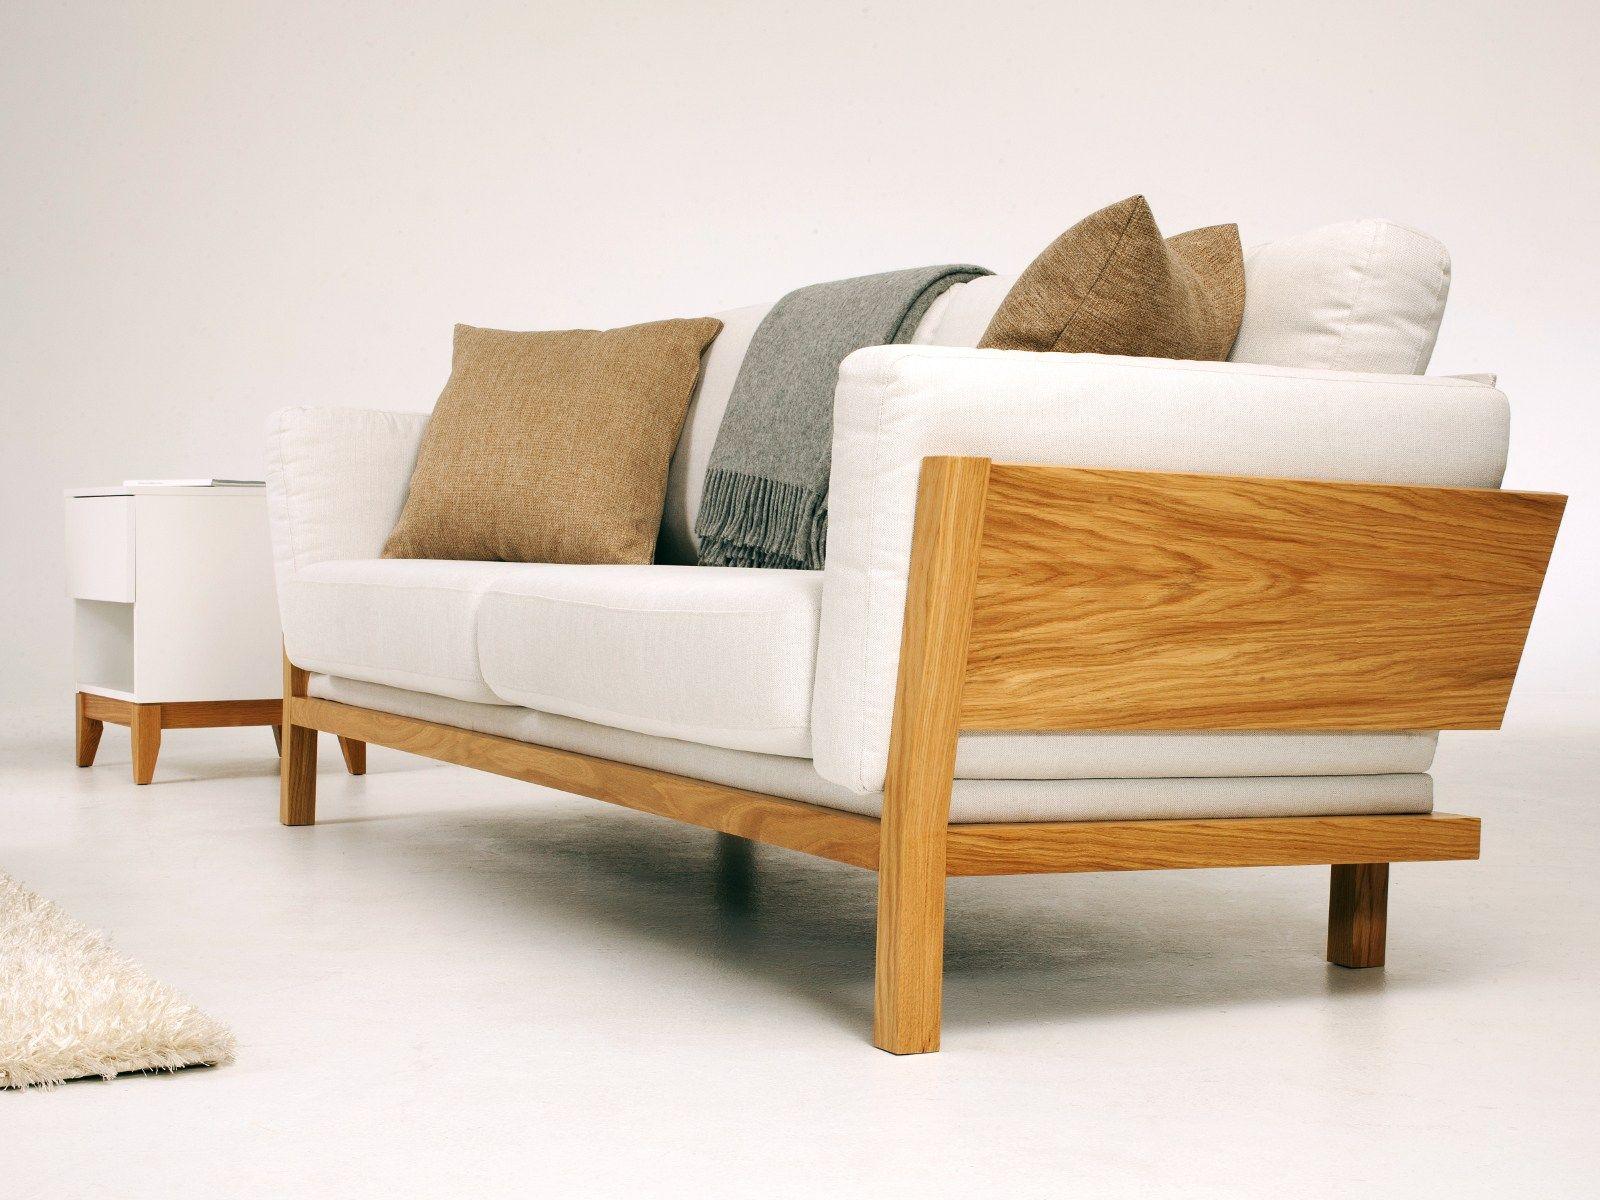 2 Seater Fabric Sofa Lanza Woodman Kanap Pinterest # Muebles Woodman